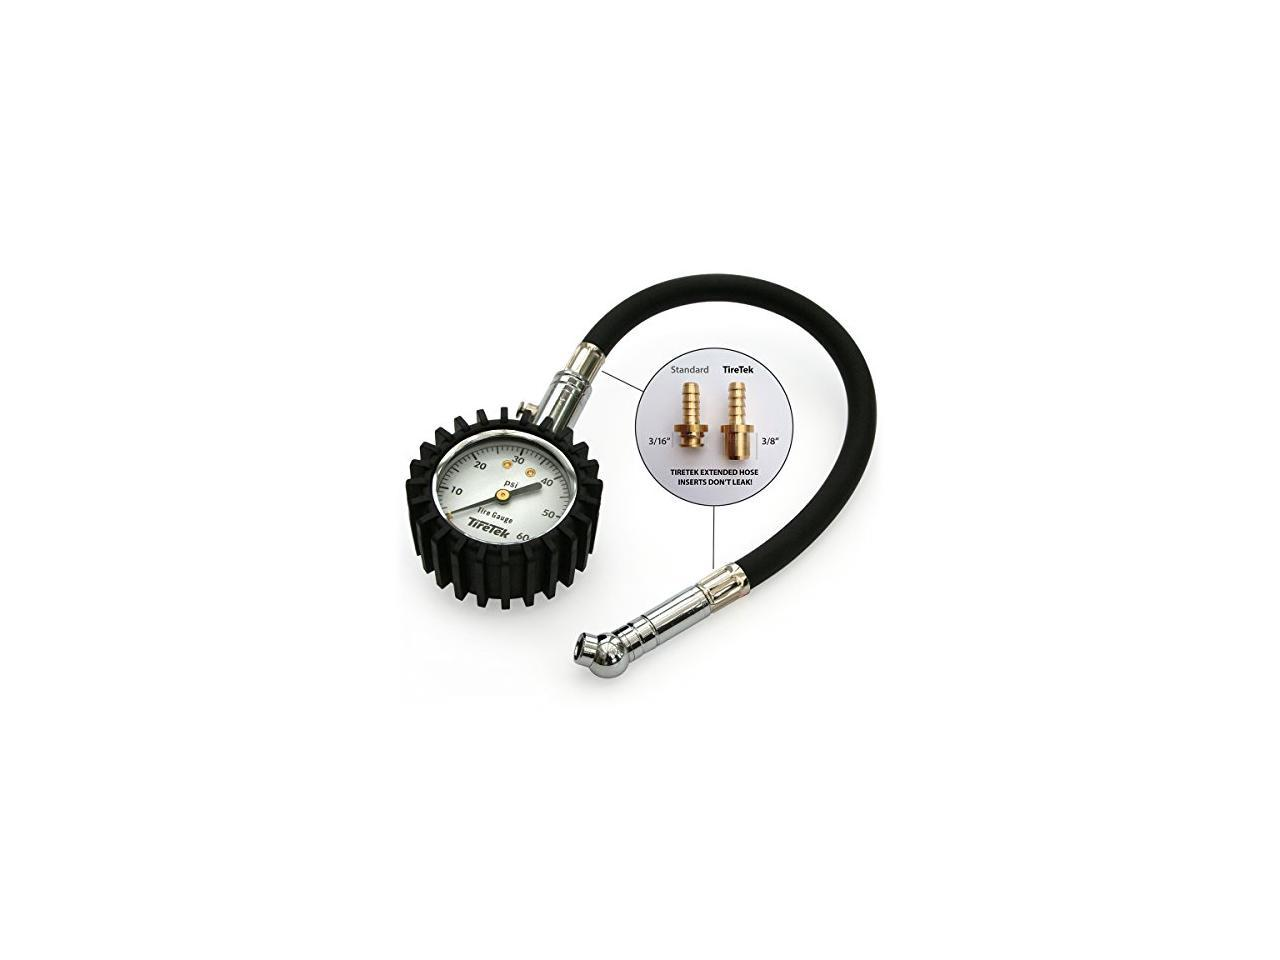 Tire Gauge Robbor 60 PSI Flexi-Pro Heavy Duty Car Motorcycle Tire Pressure Gauge